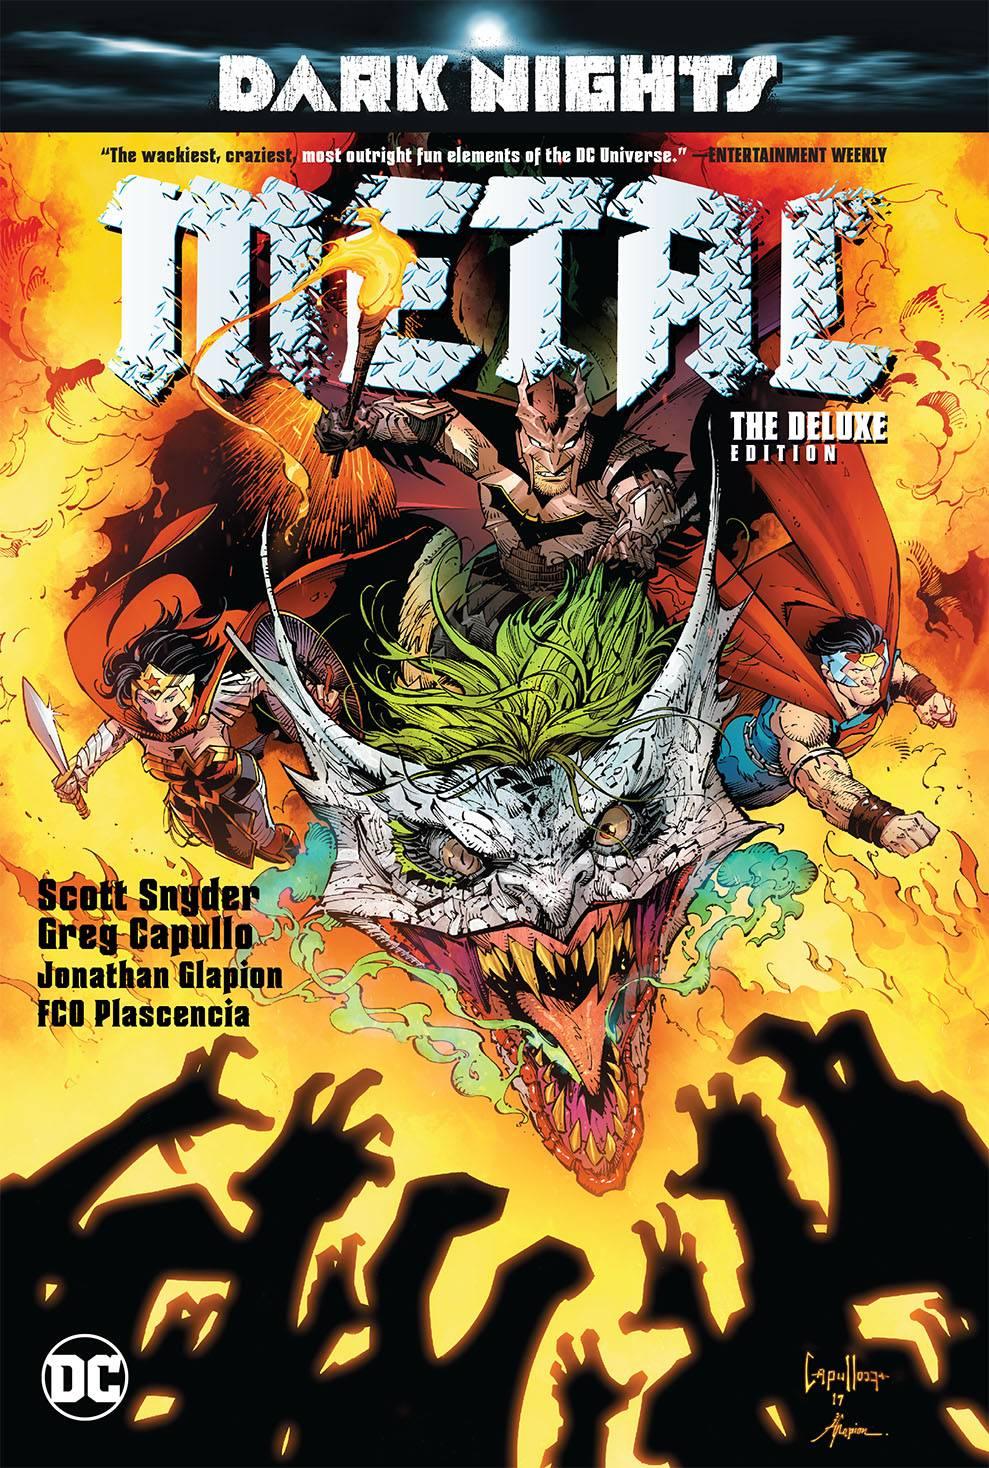 Justice League and Dark Nights: Metal top bestselling comics